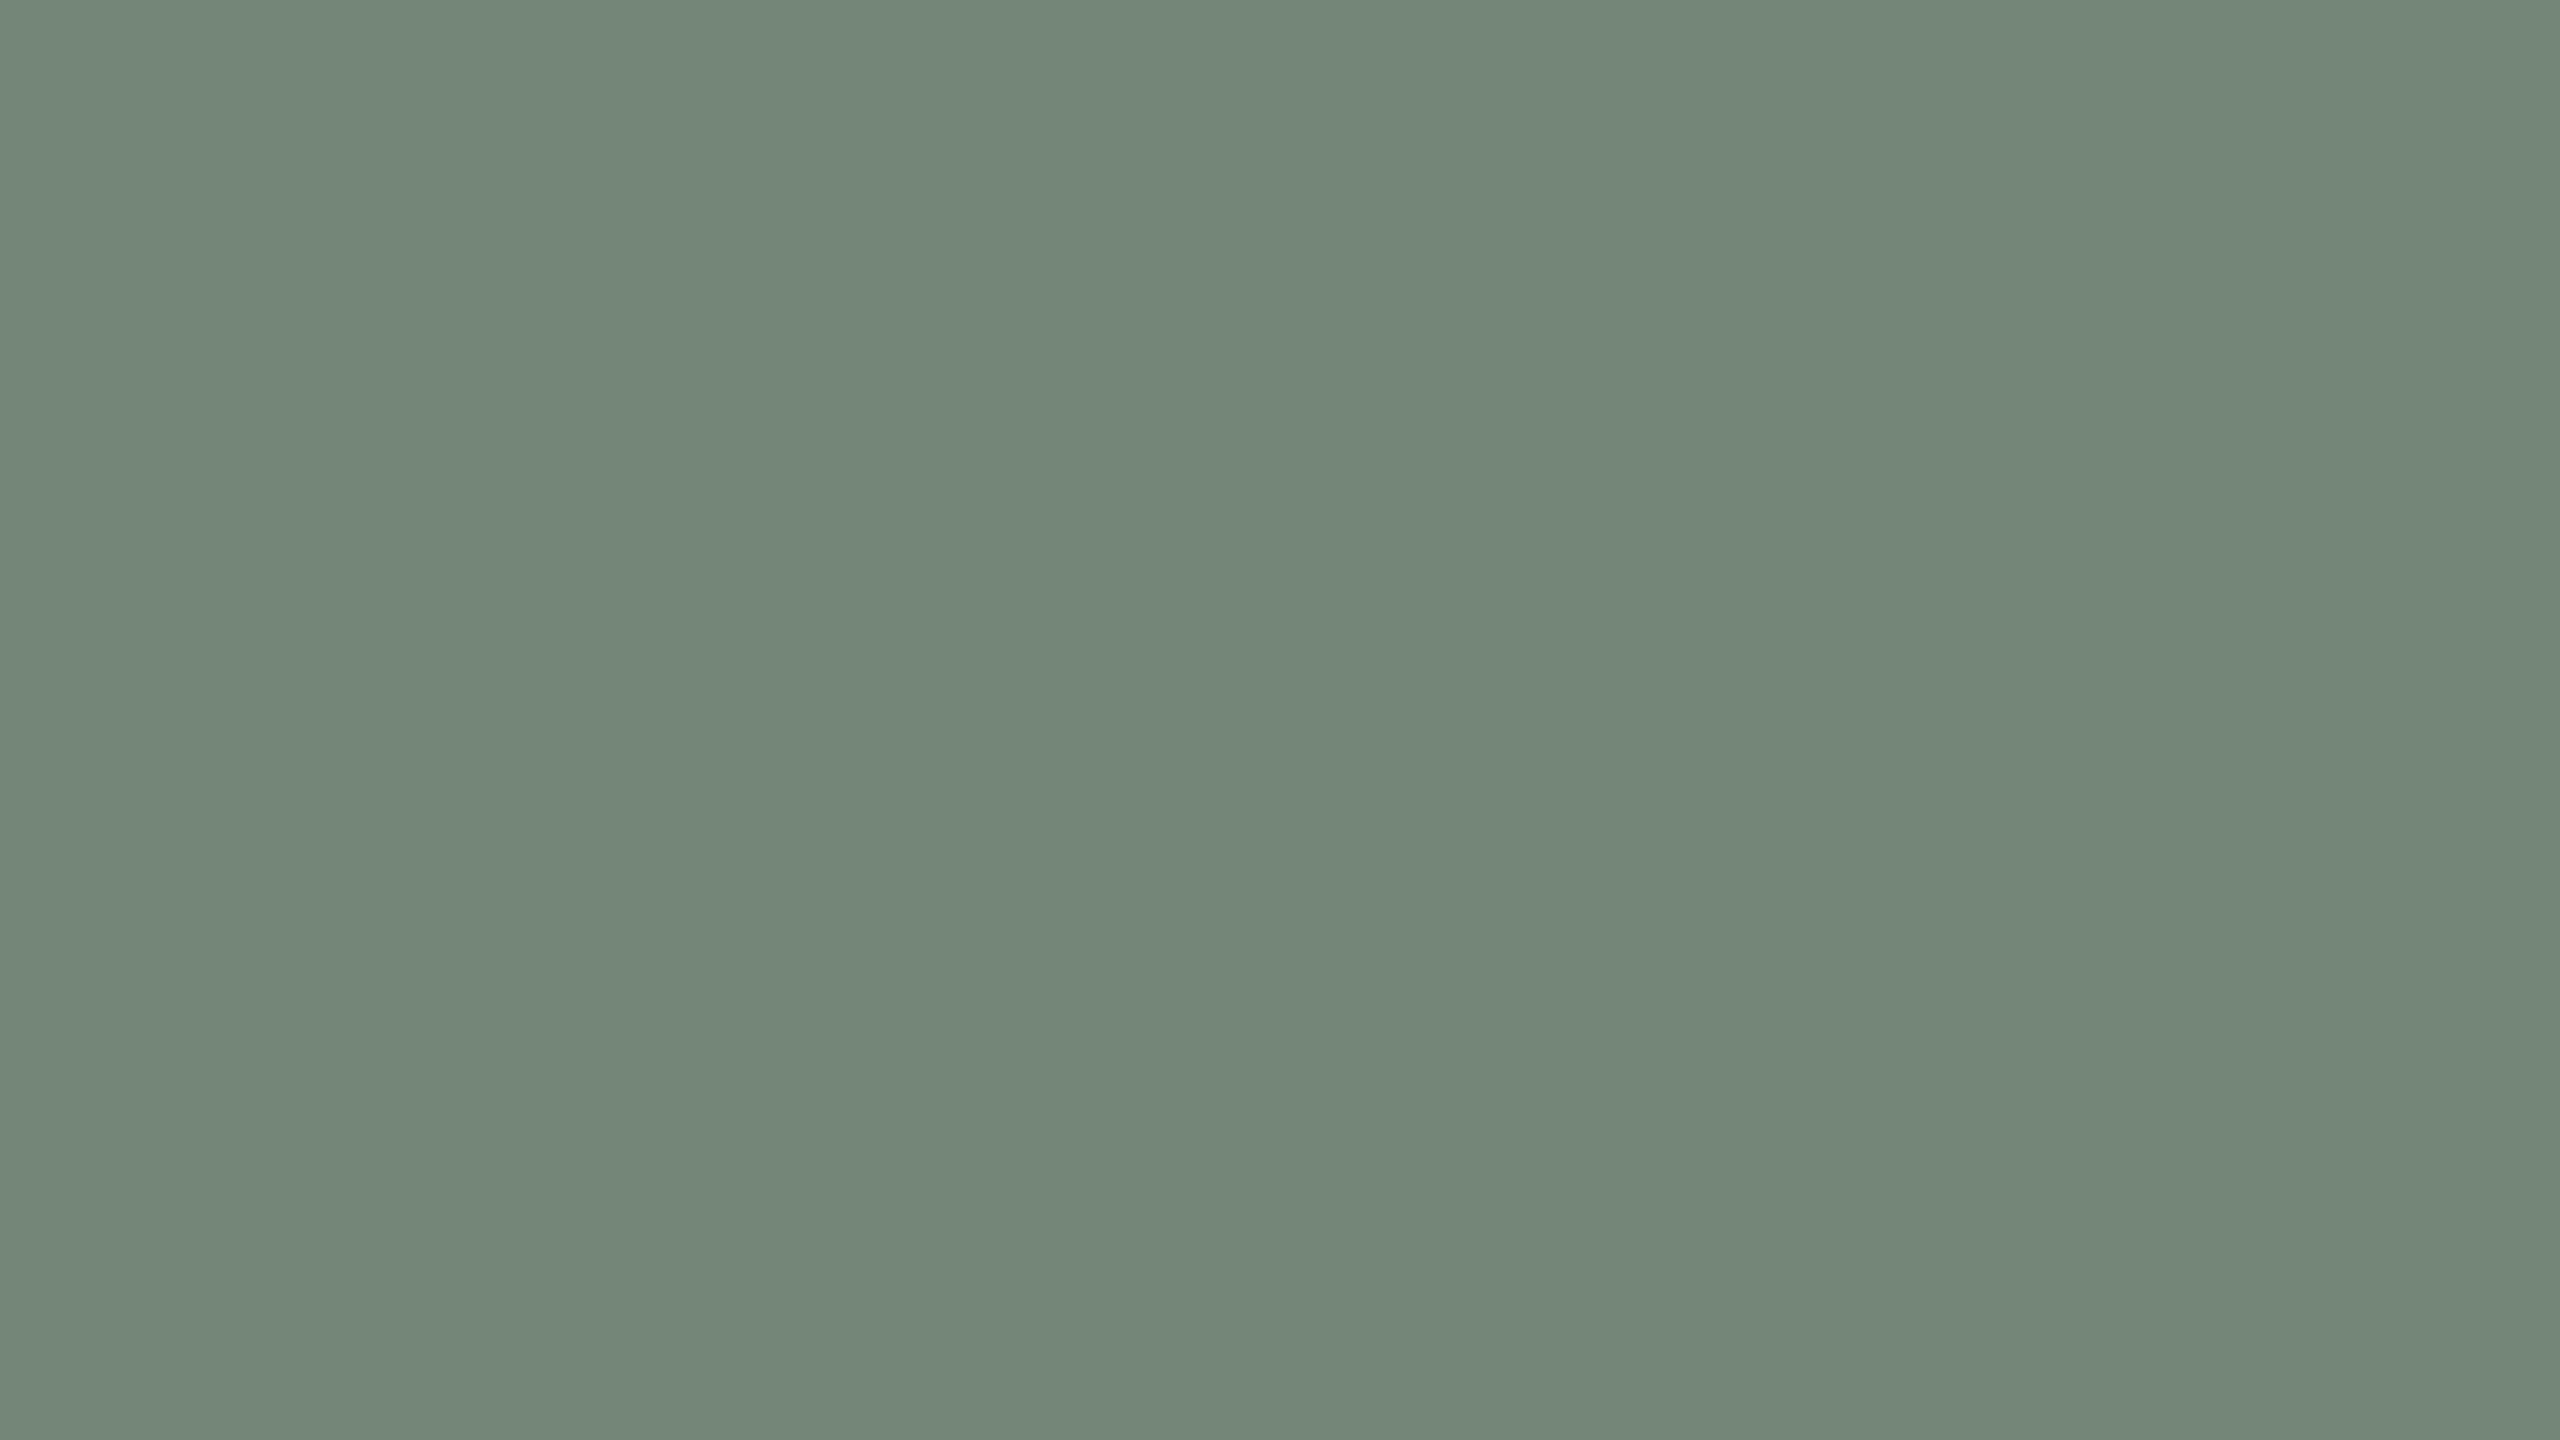 2560x1440 xanadu solid color background